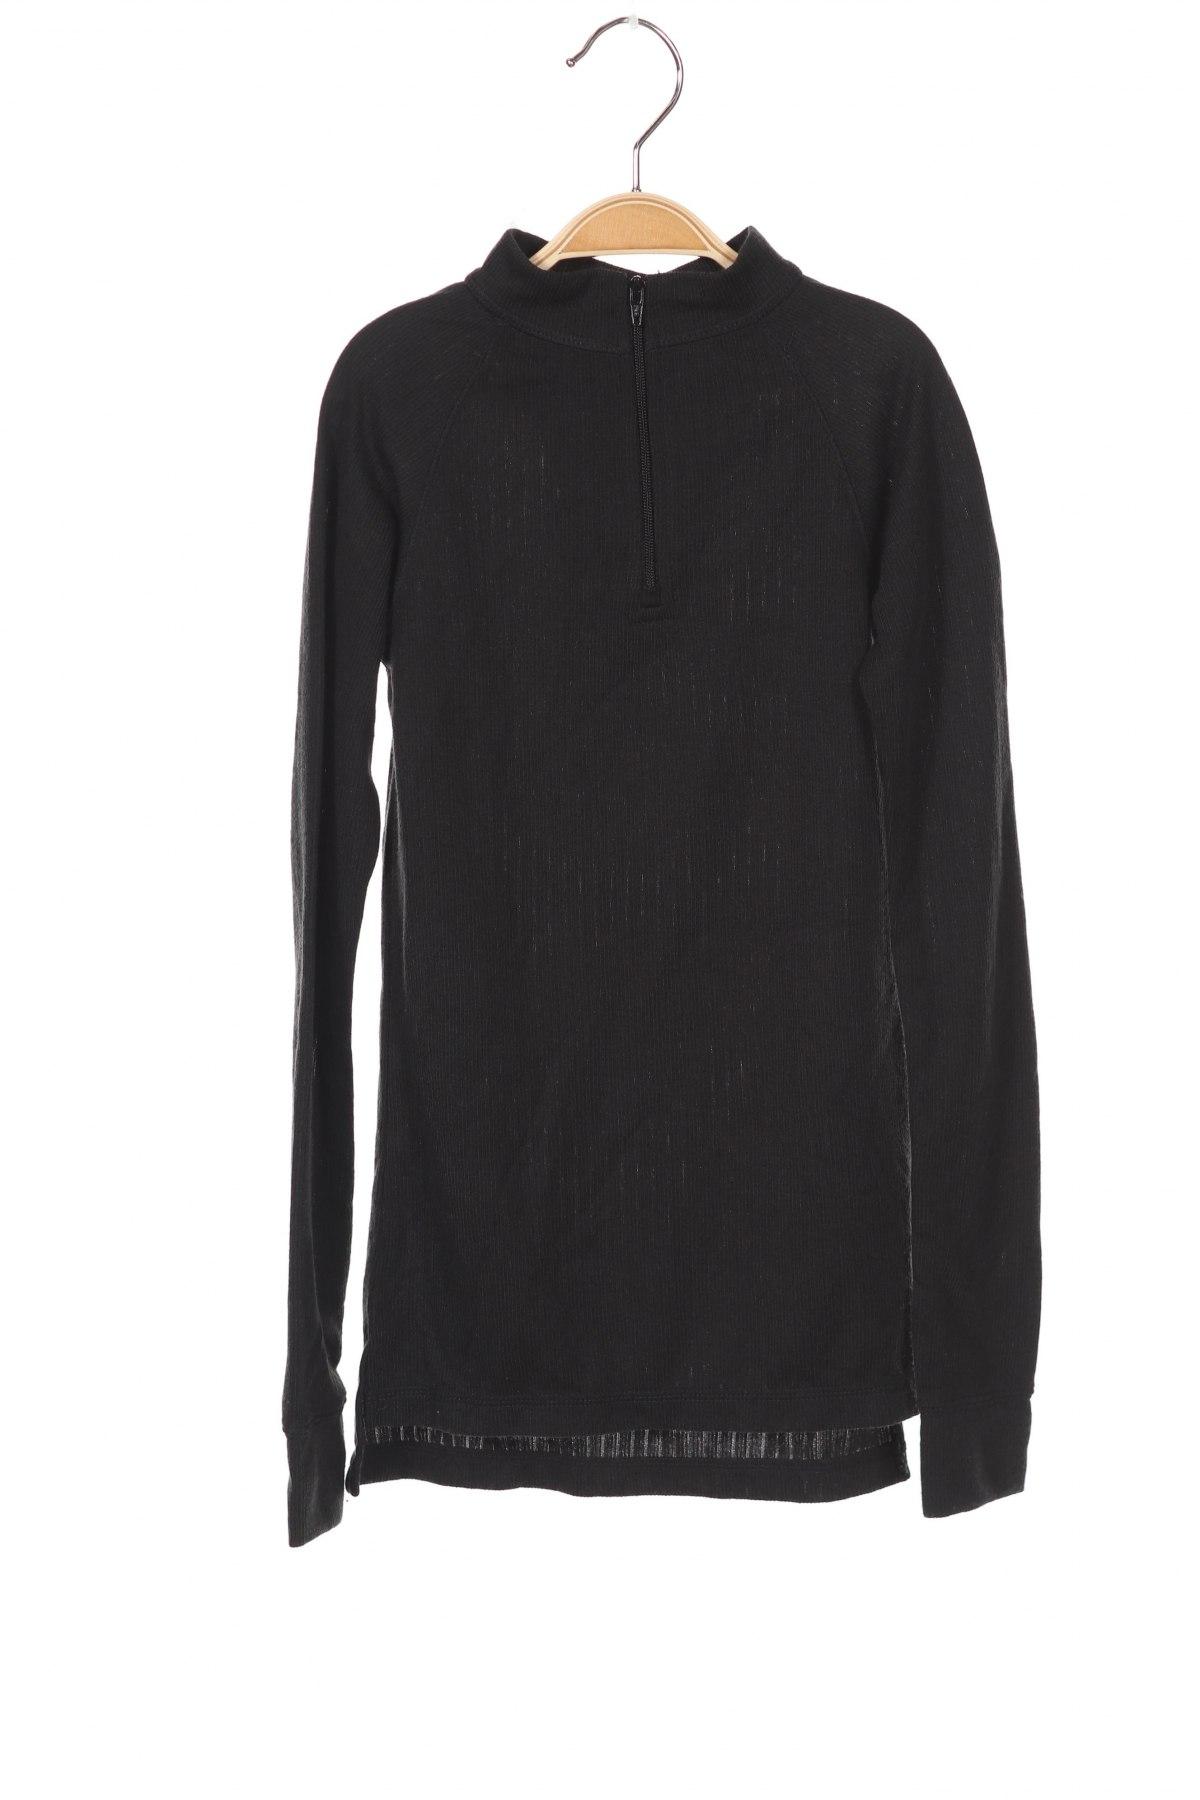 Детска спортна блуза Trespass, Размер 4-5y/ 110-116 см, Цвят Черен, Полиестер, Цена 6,48лв.